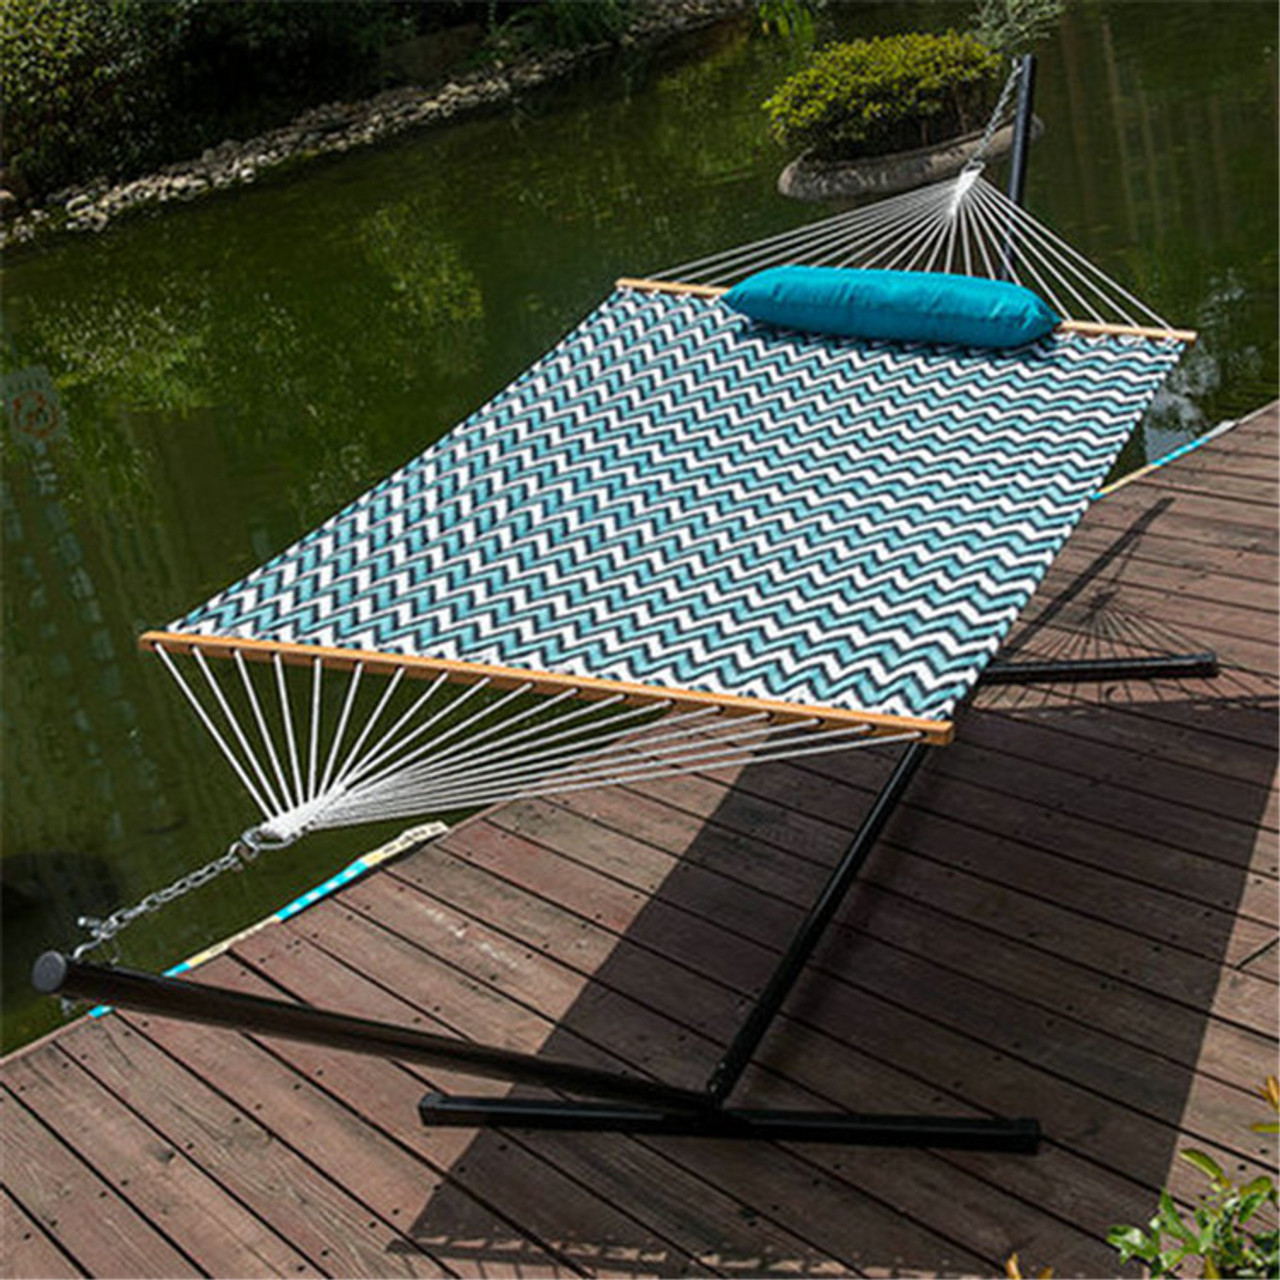 lazy daze hammocks 15 feet heavy duty steel hammock stand two person quilted fabric hammock 15 feet heavy duty steel hammock stand  two person quilted fabric      rh   sundaleoutdoor